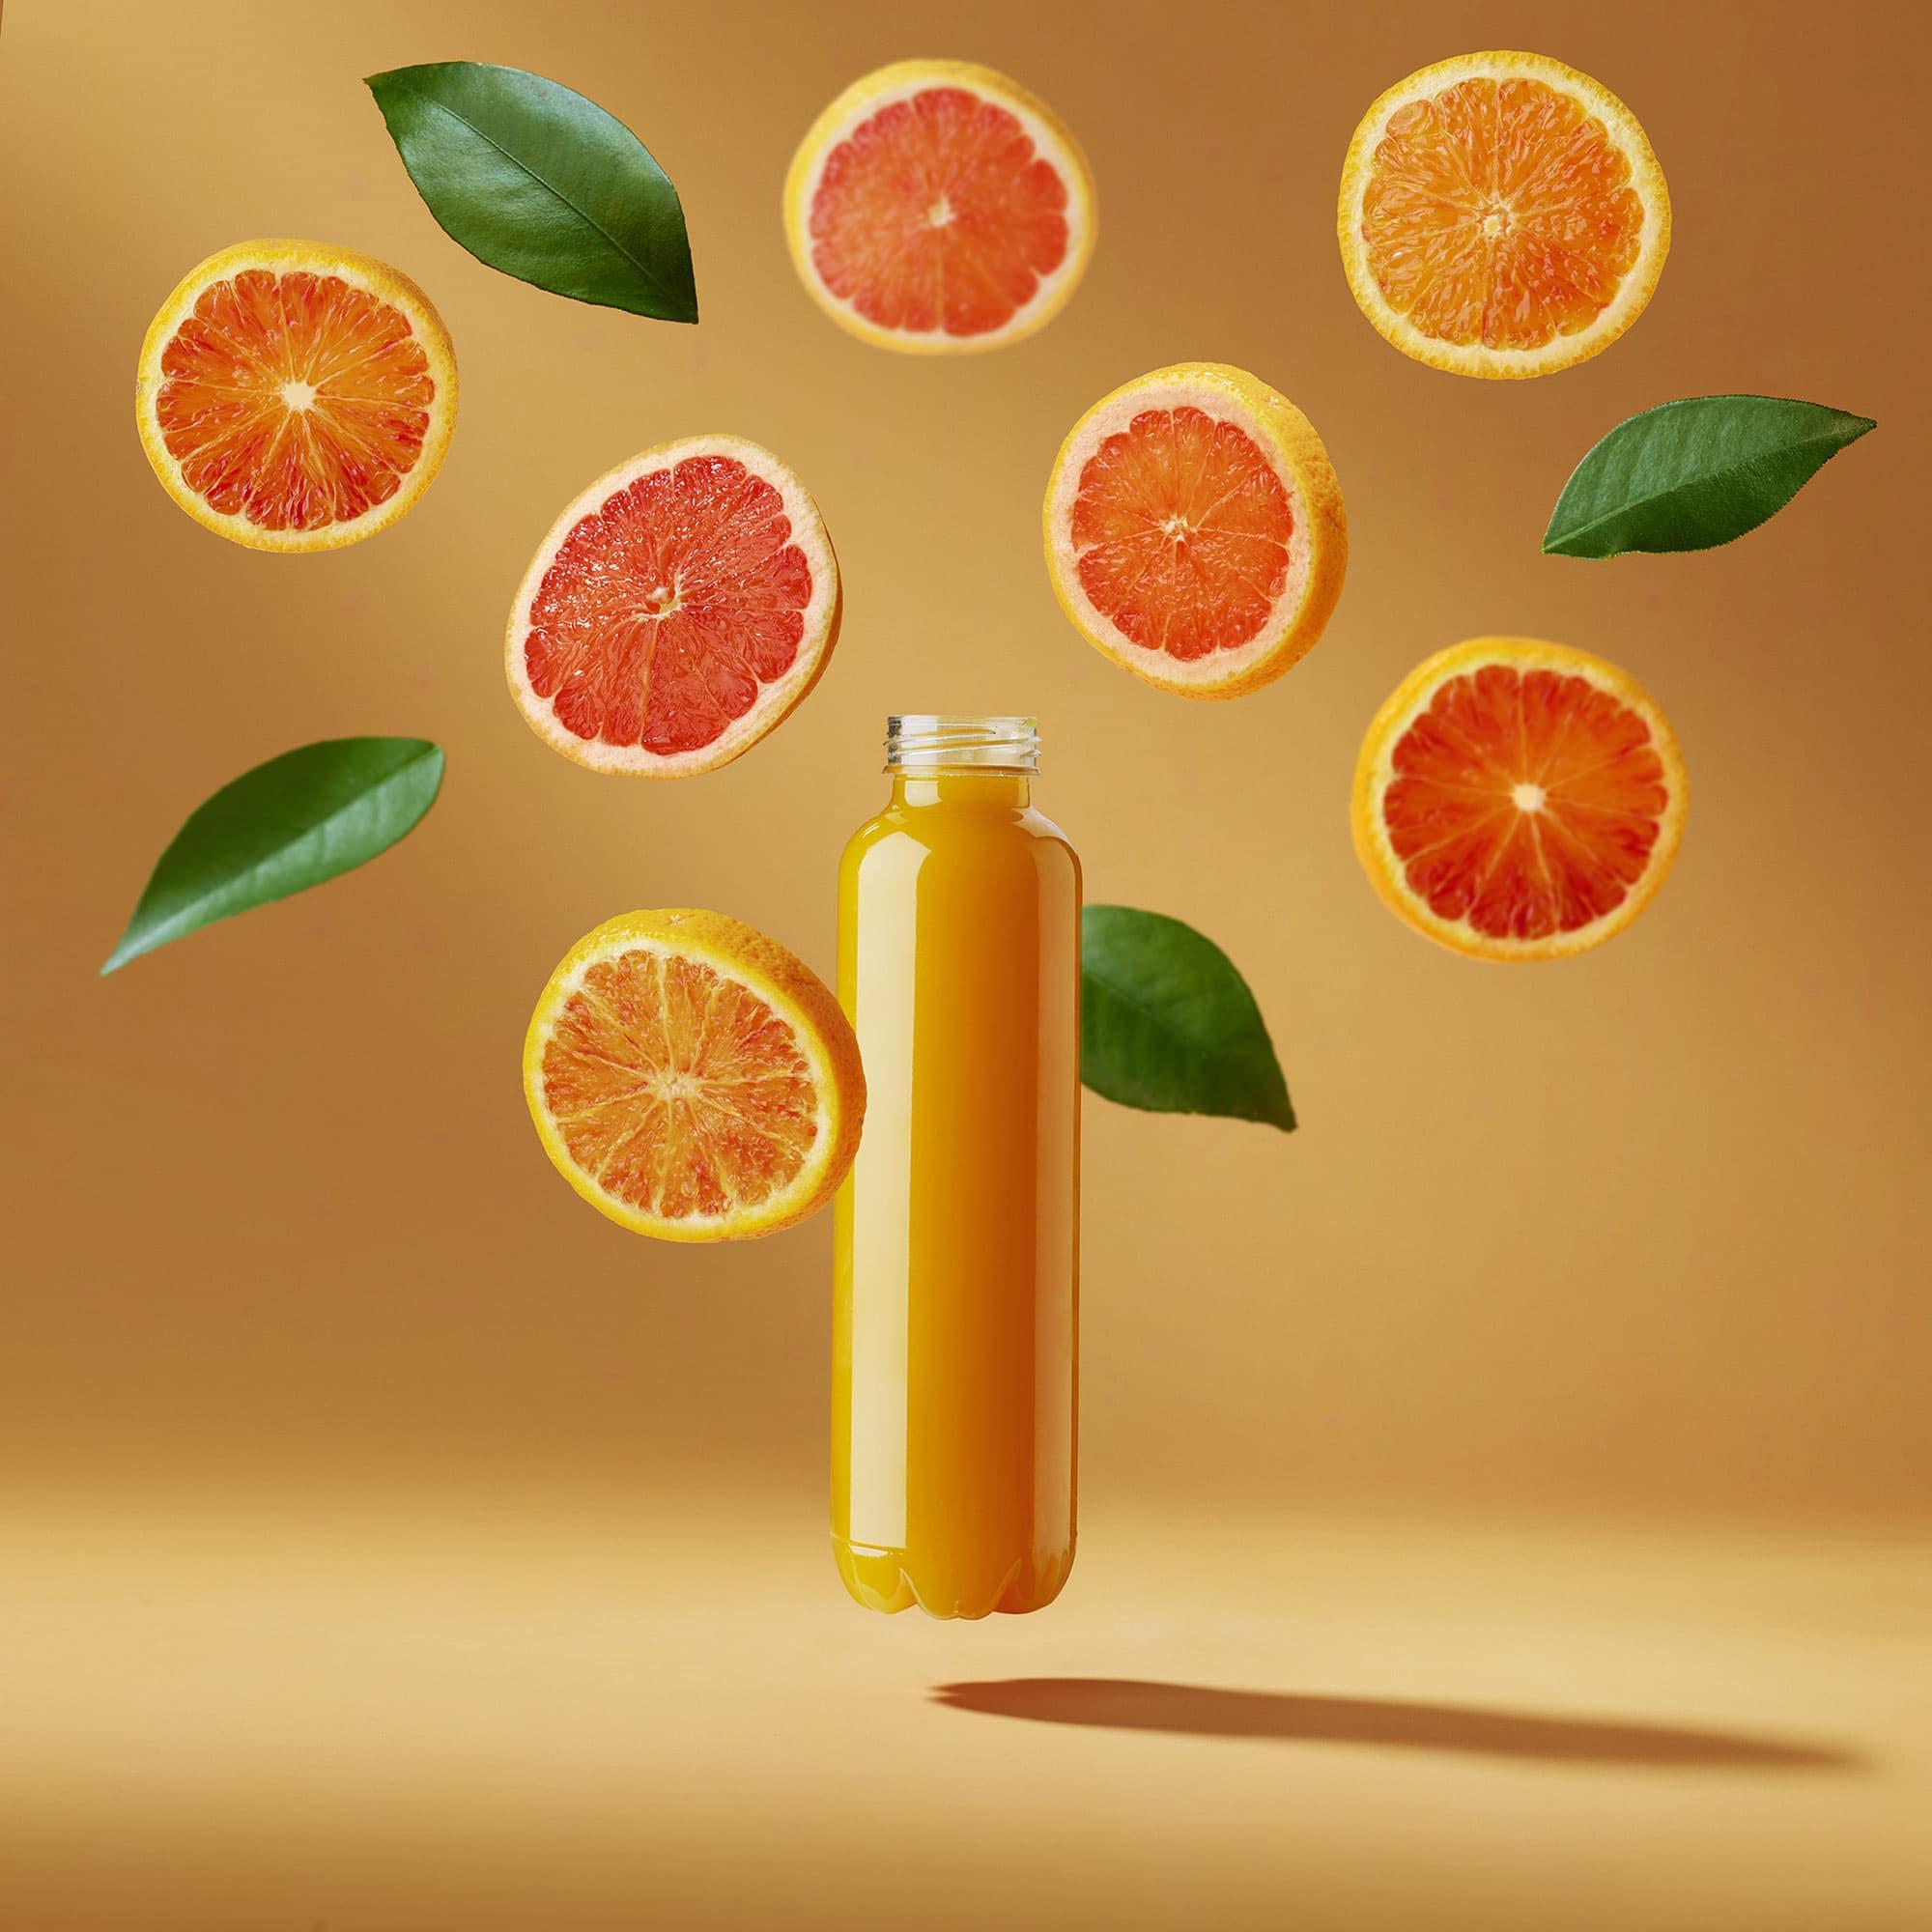 Orange Oranges Bottle Still Life Shot for Corepla by Fotografando